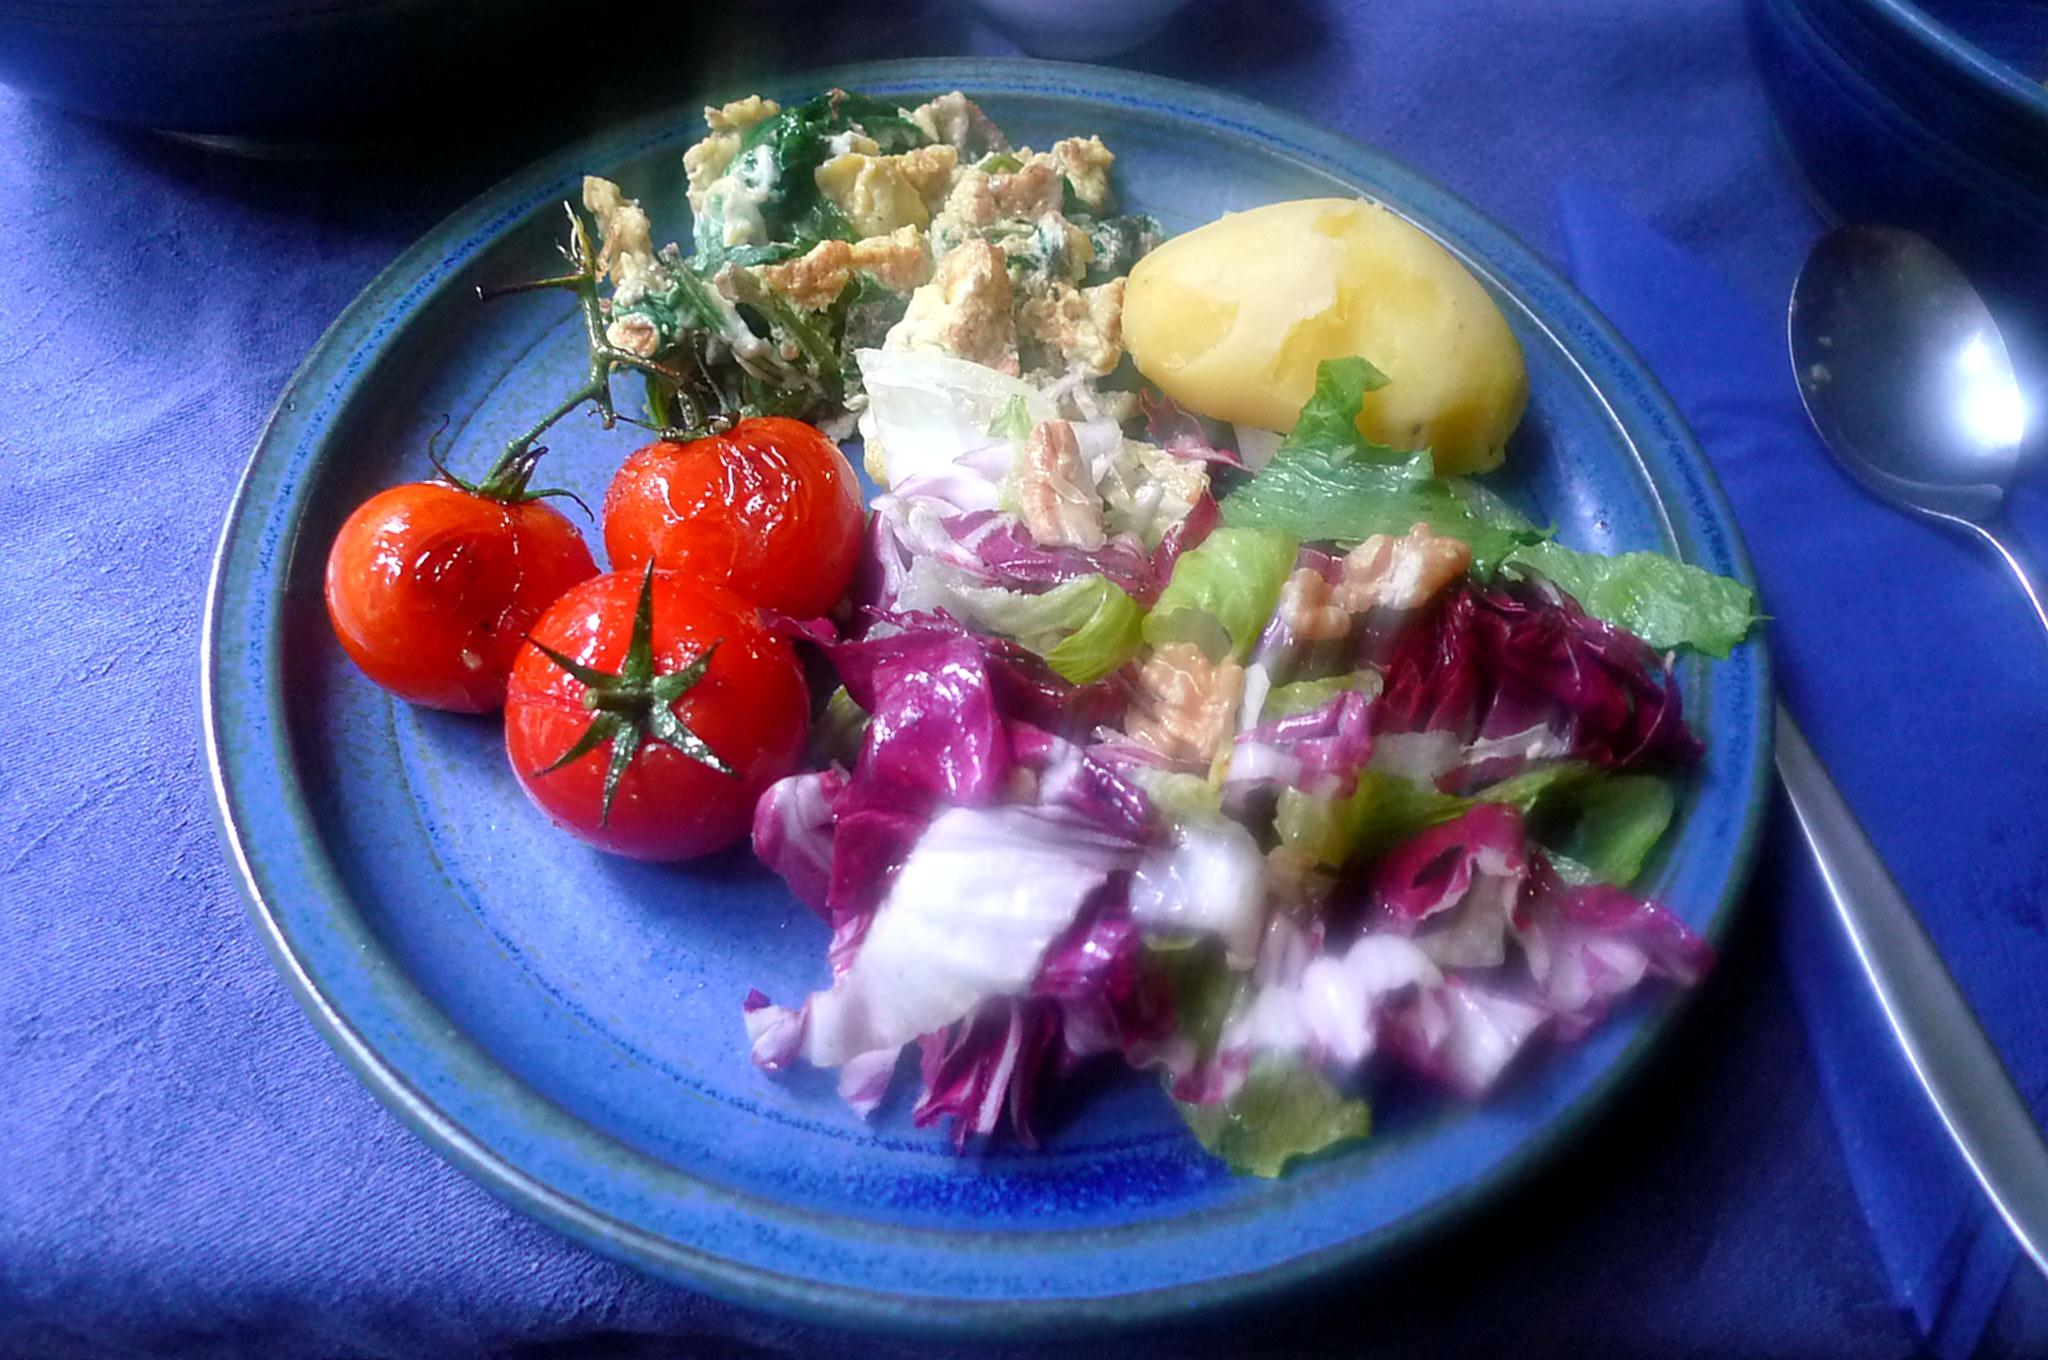 Spinat mit Rührei,Salat,Kartoffel,gebratene Tomaten -- 11.9.14   (14)